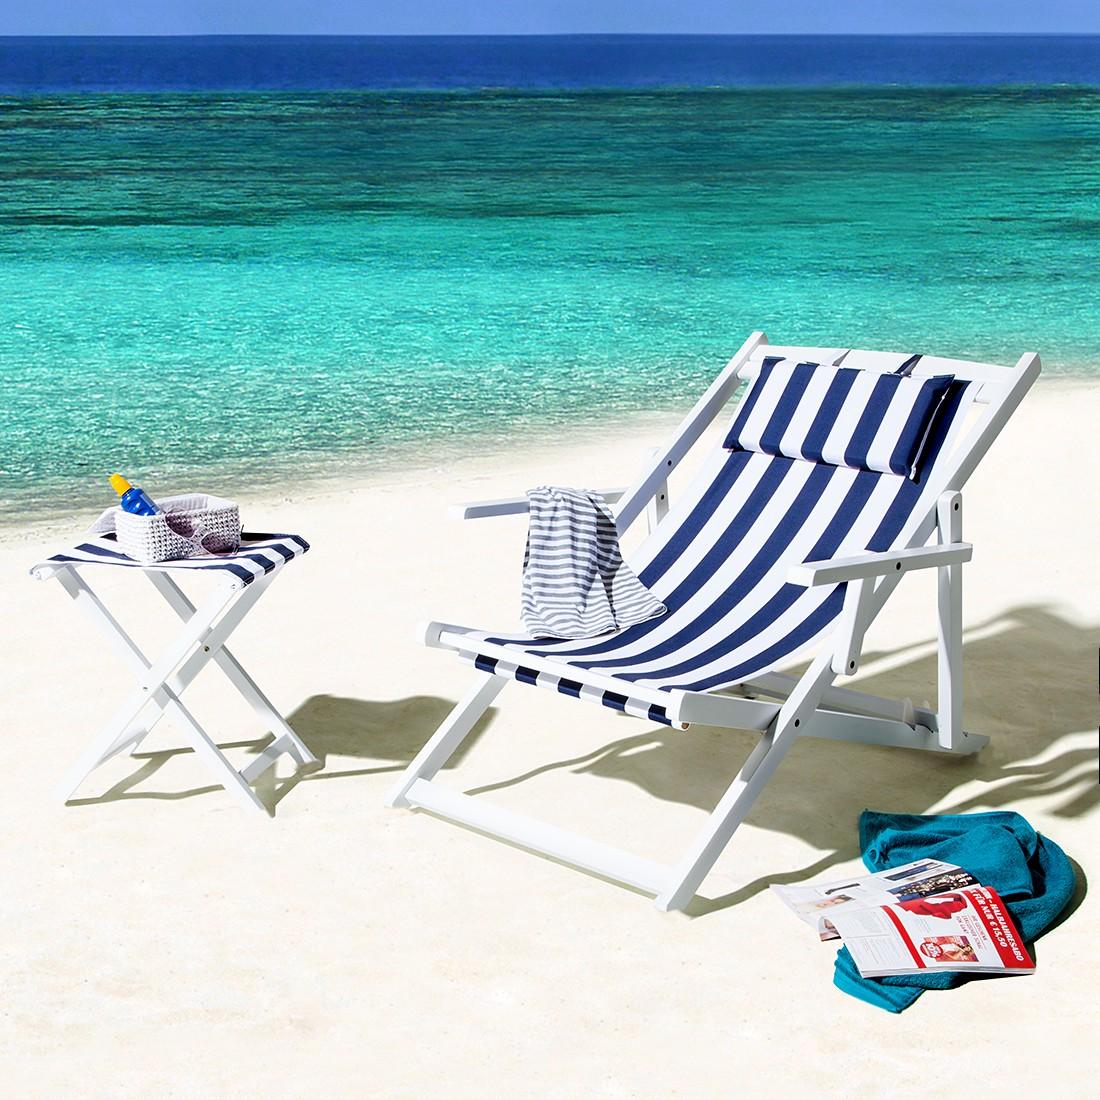 Summer Sun (2-teilig) Gartenmöbelset - Holz/Polyester - Weiß/Blau-Weiß gestreift